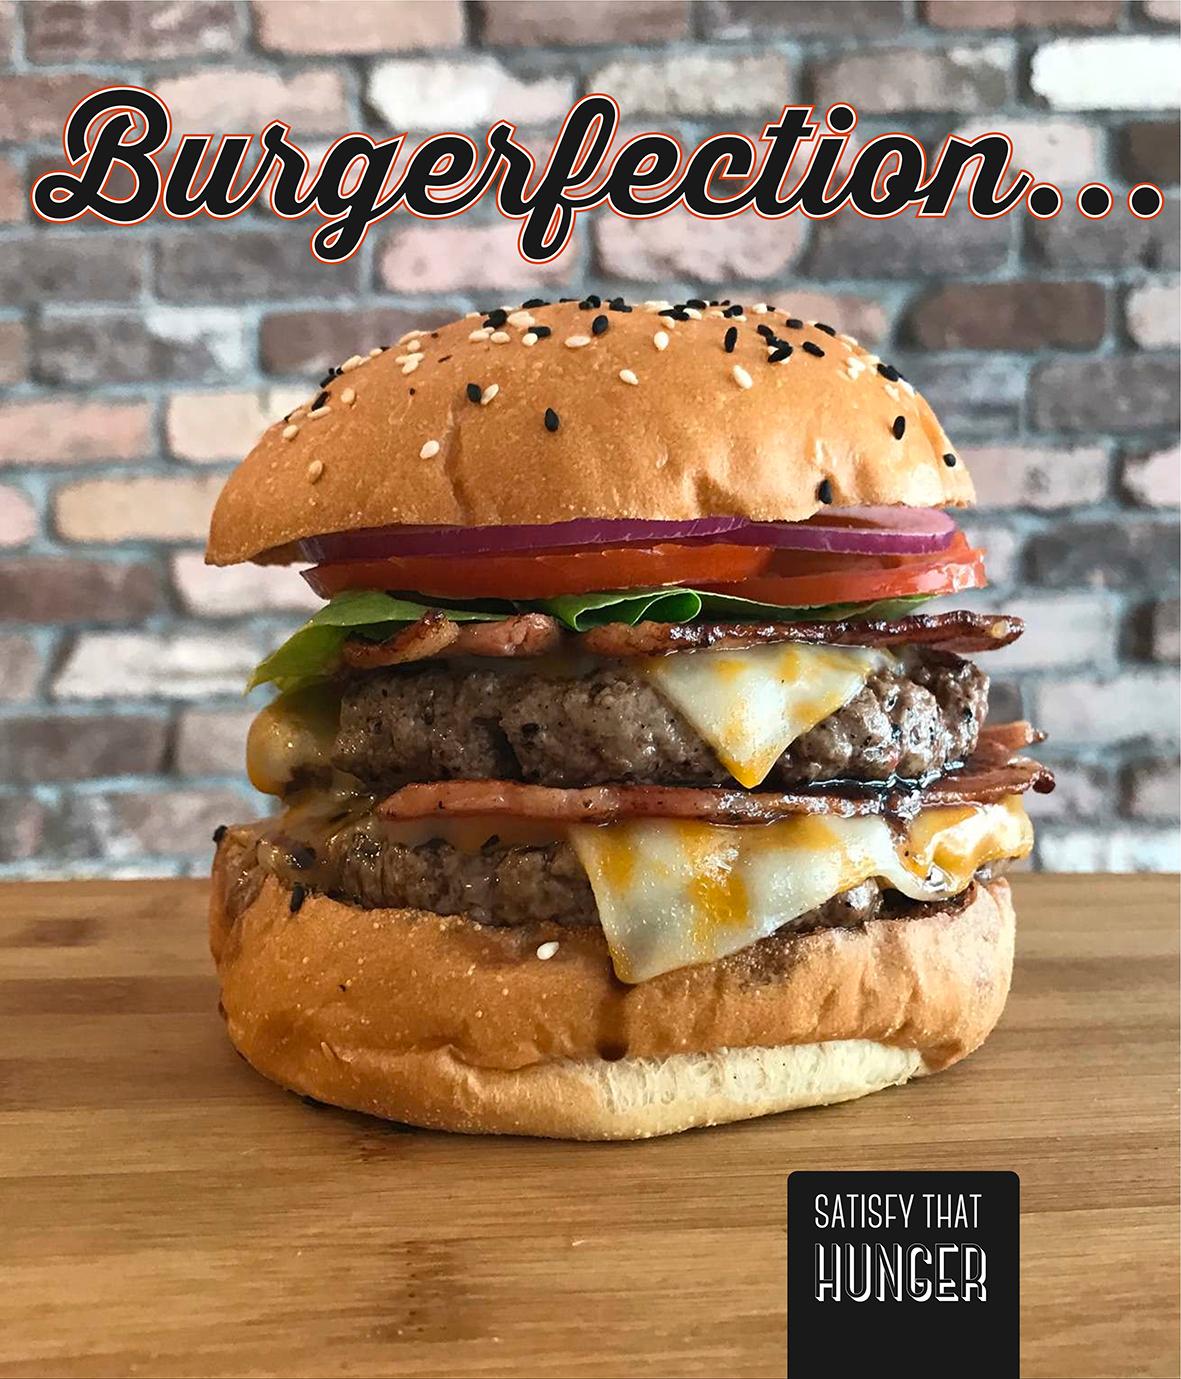 Burger'd Campaign